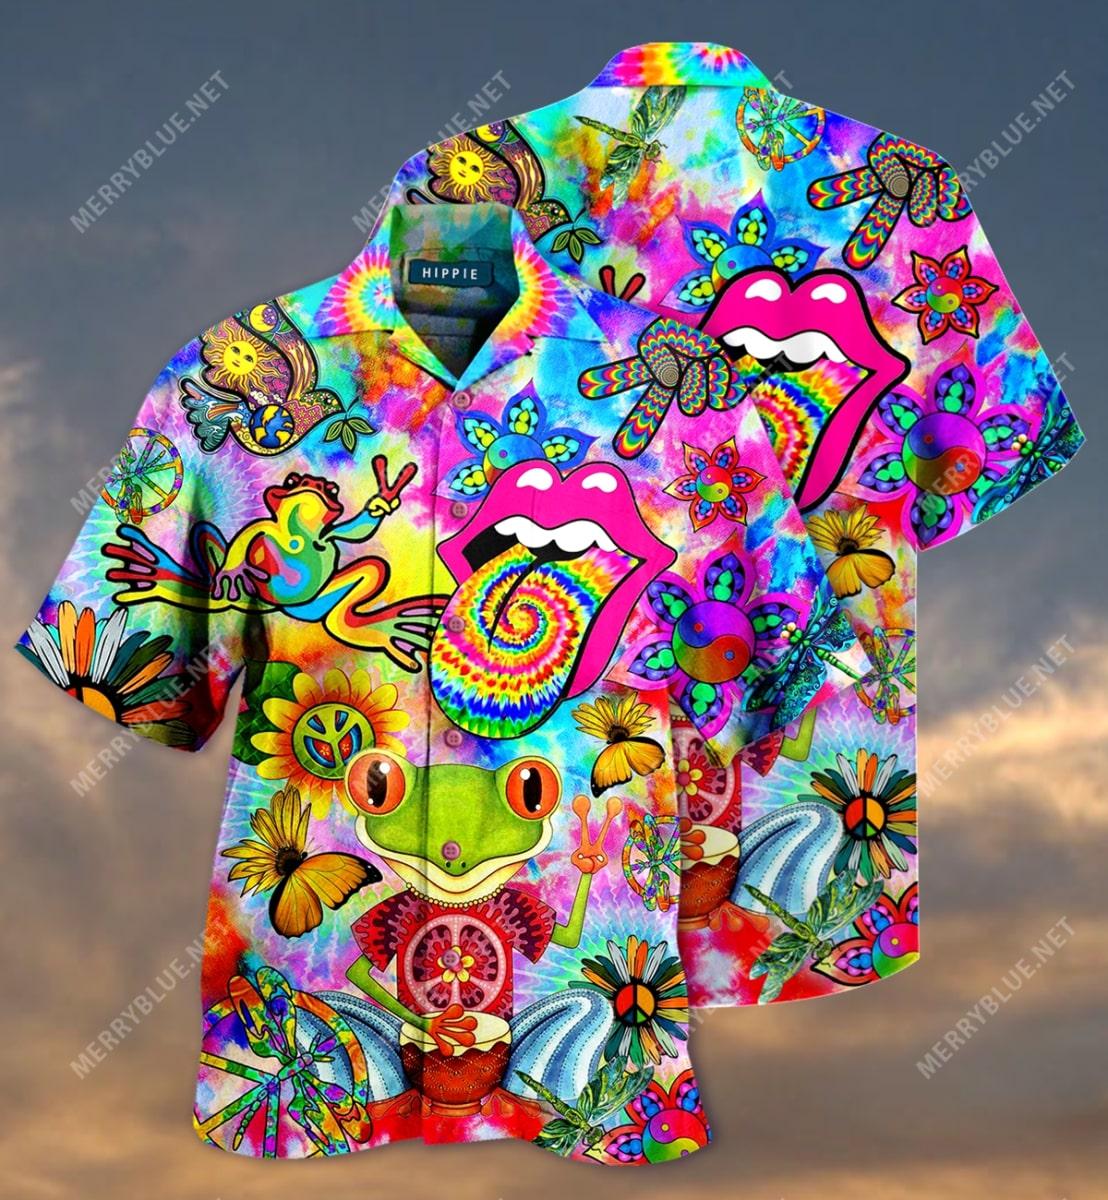 hippie feeling groovy colorful all over printed hawaiian shirt 2